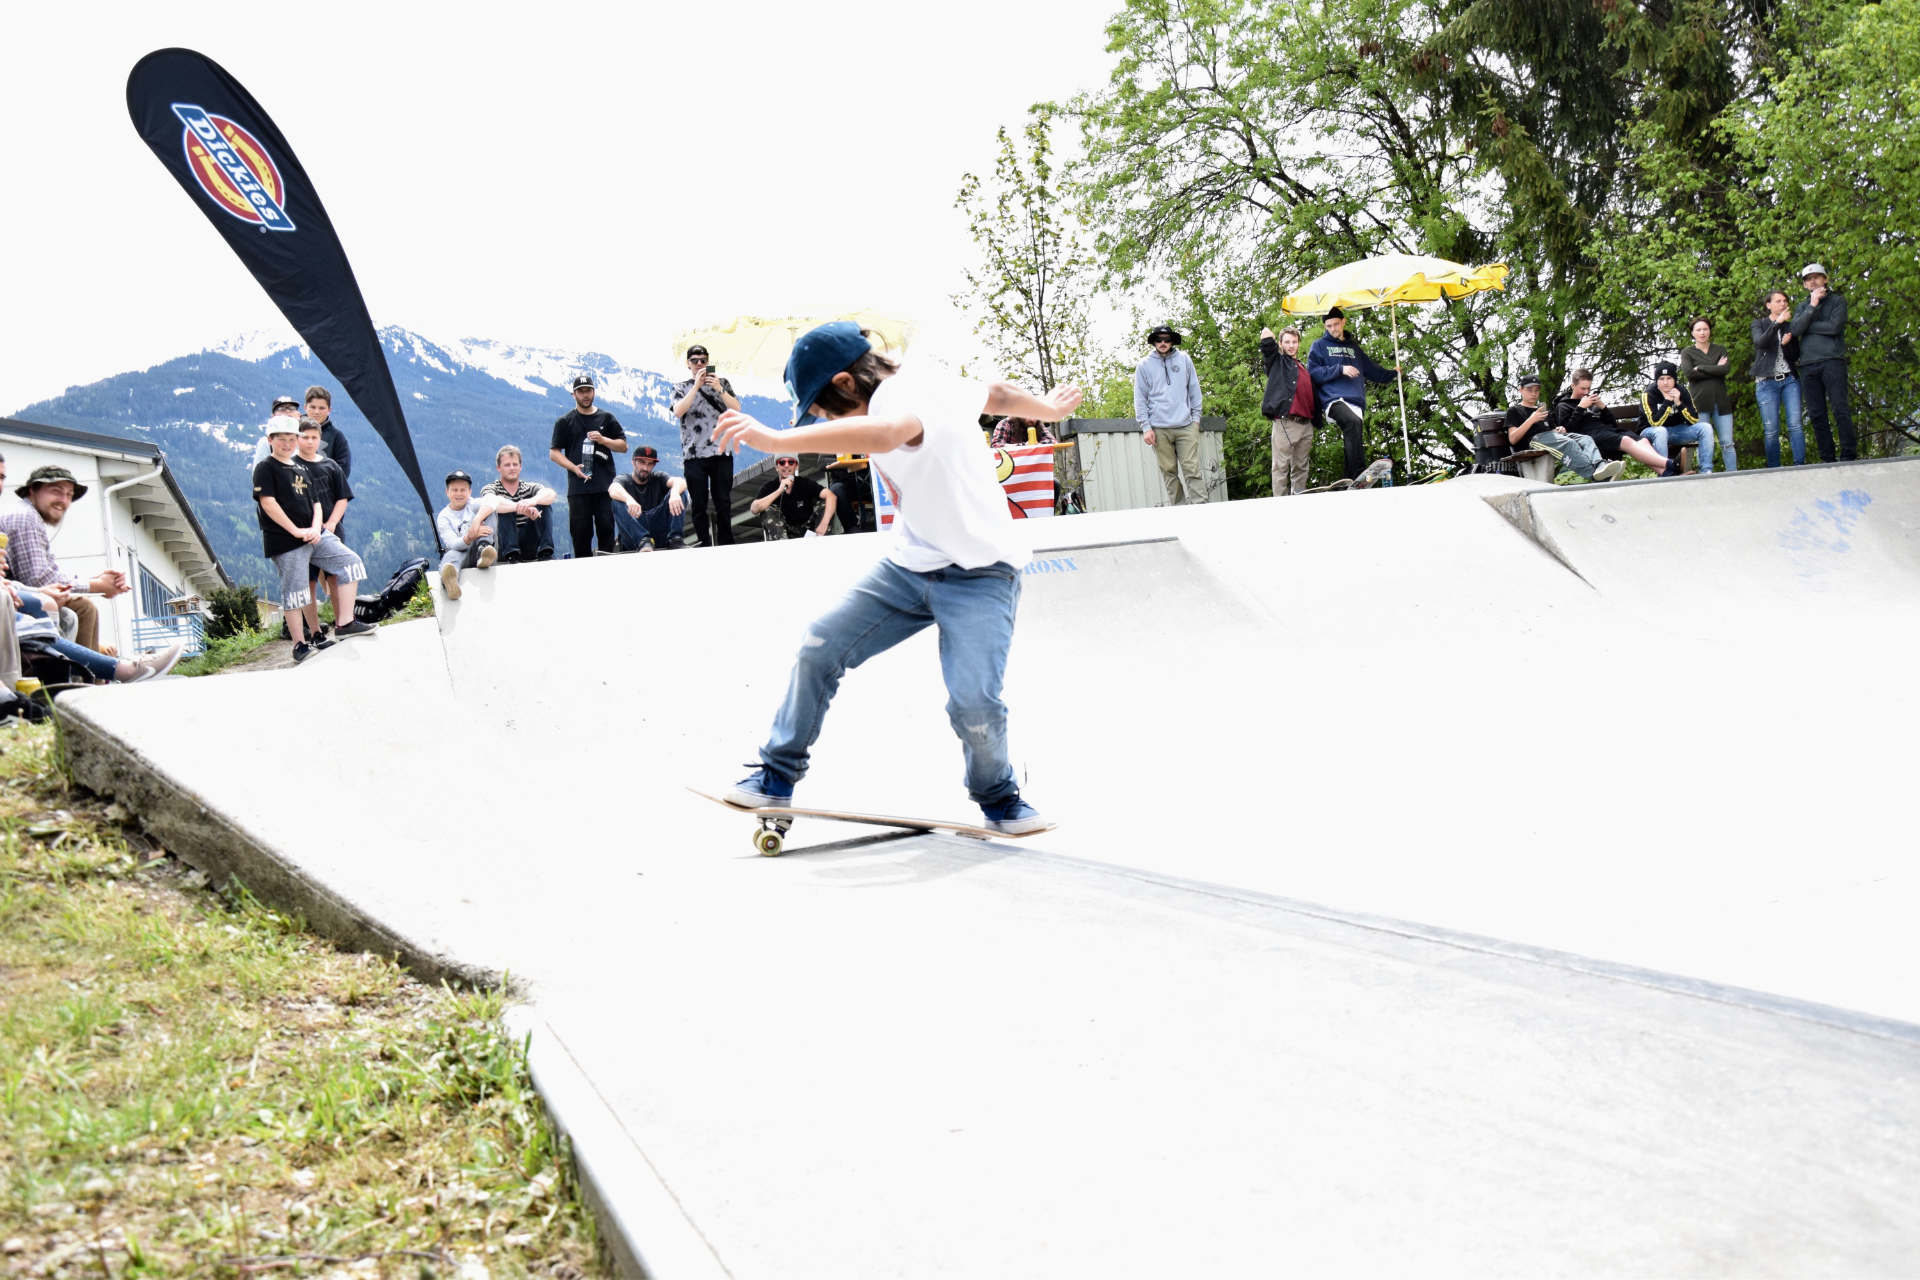 skateboard headz fieberbrunn kgt kitz gau trophy 2019 saalfelden00008